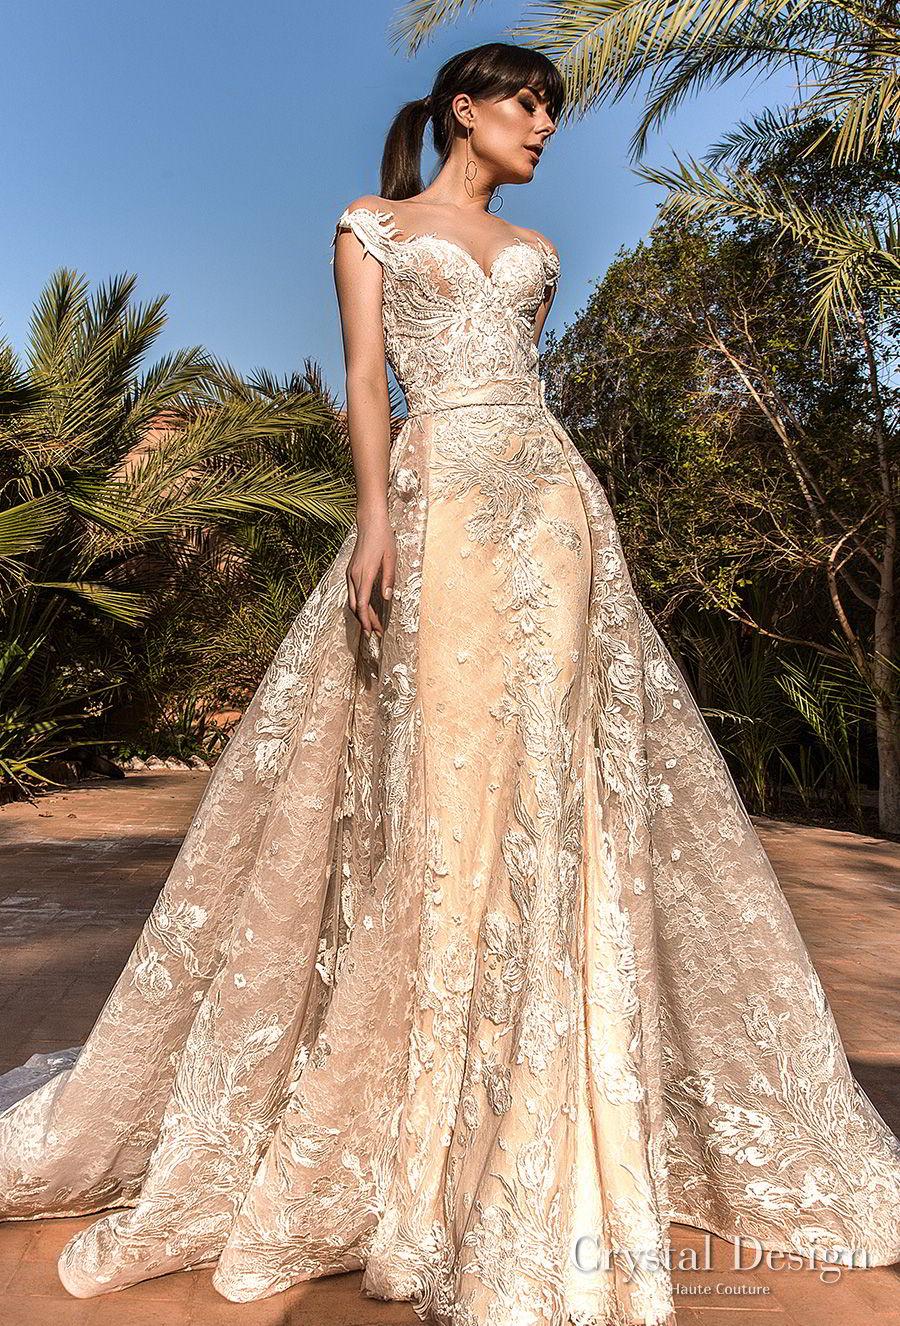 crystal design 2018 cap sleeves sweetheart neckline full embellishment princess a line wedding dress sheer back royal train (butterfly) mv